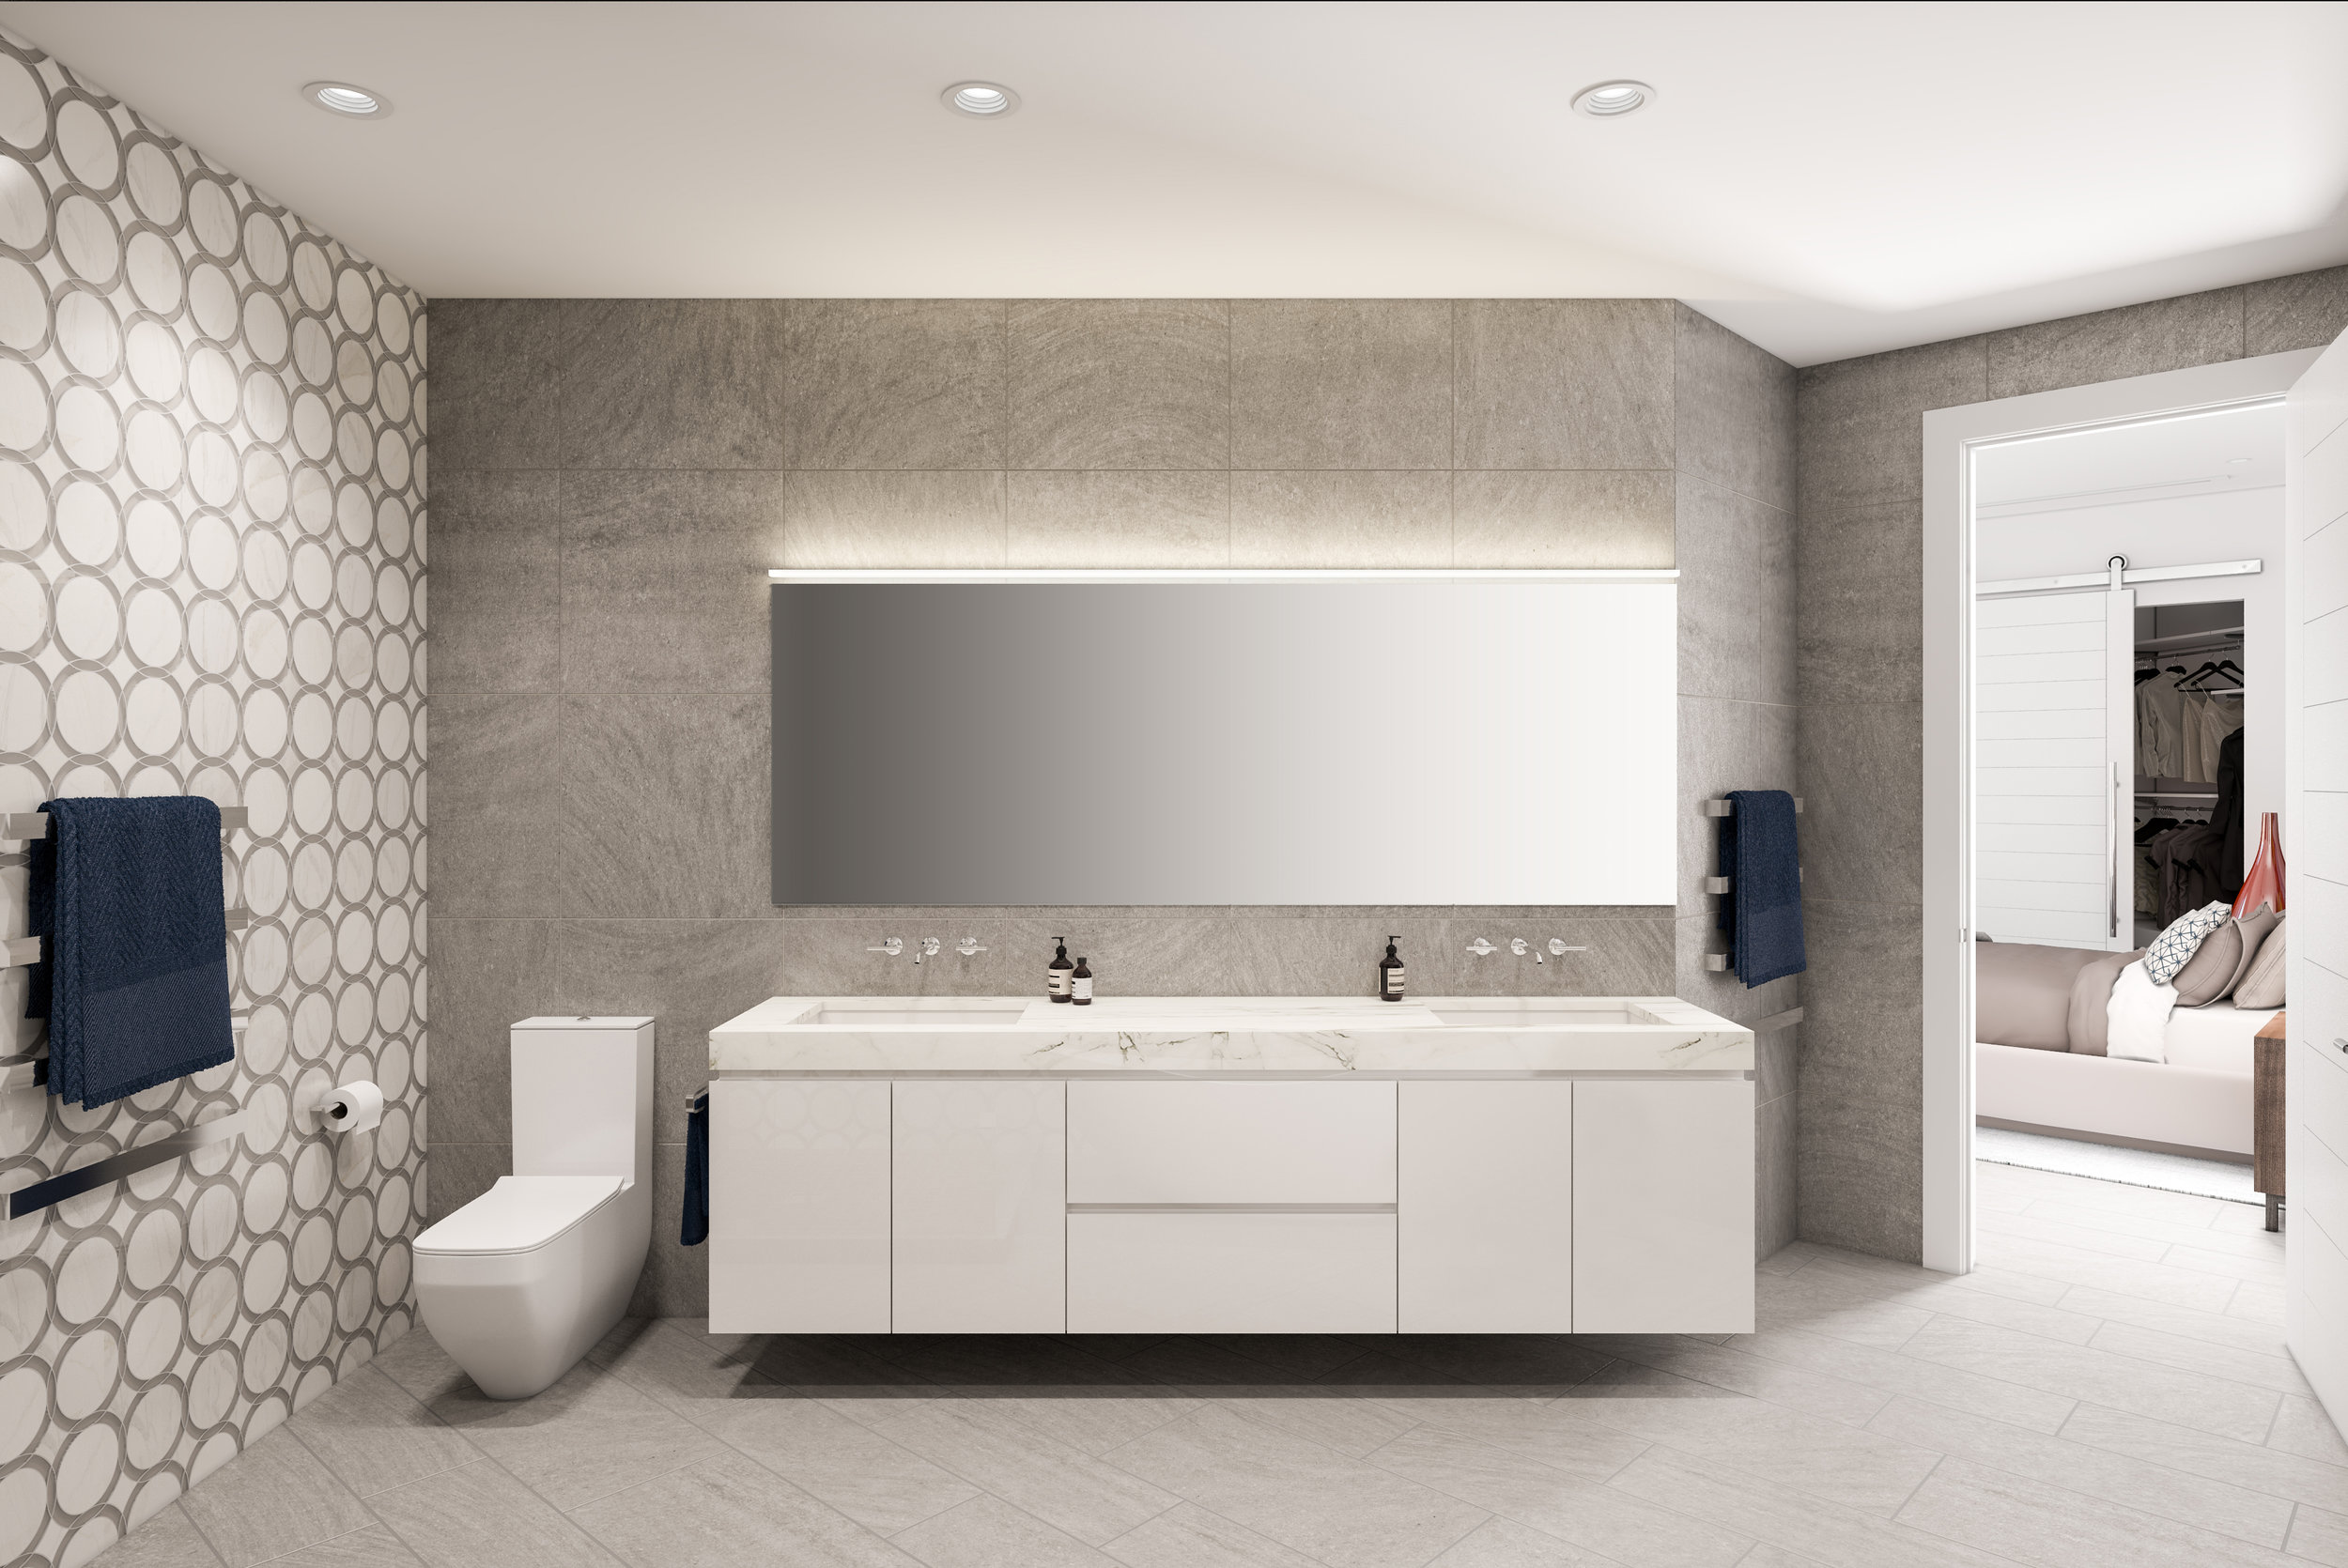 RumPoint_Bathroom1_Final01.jpg